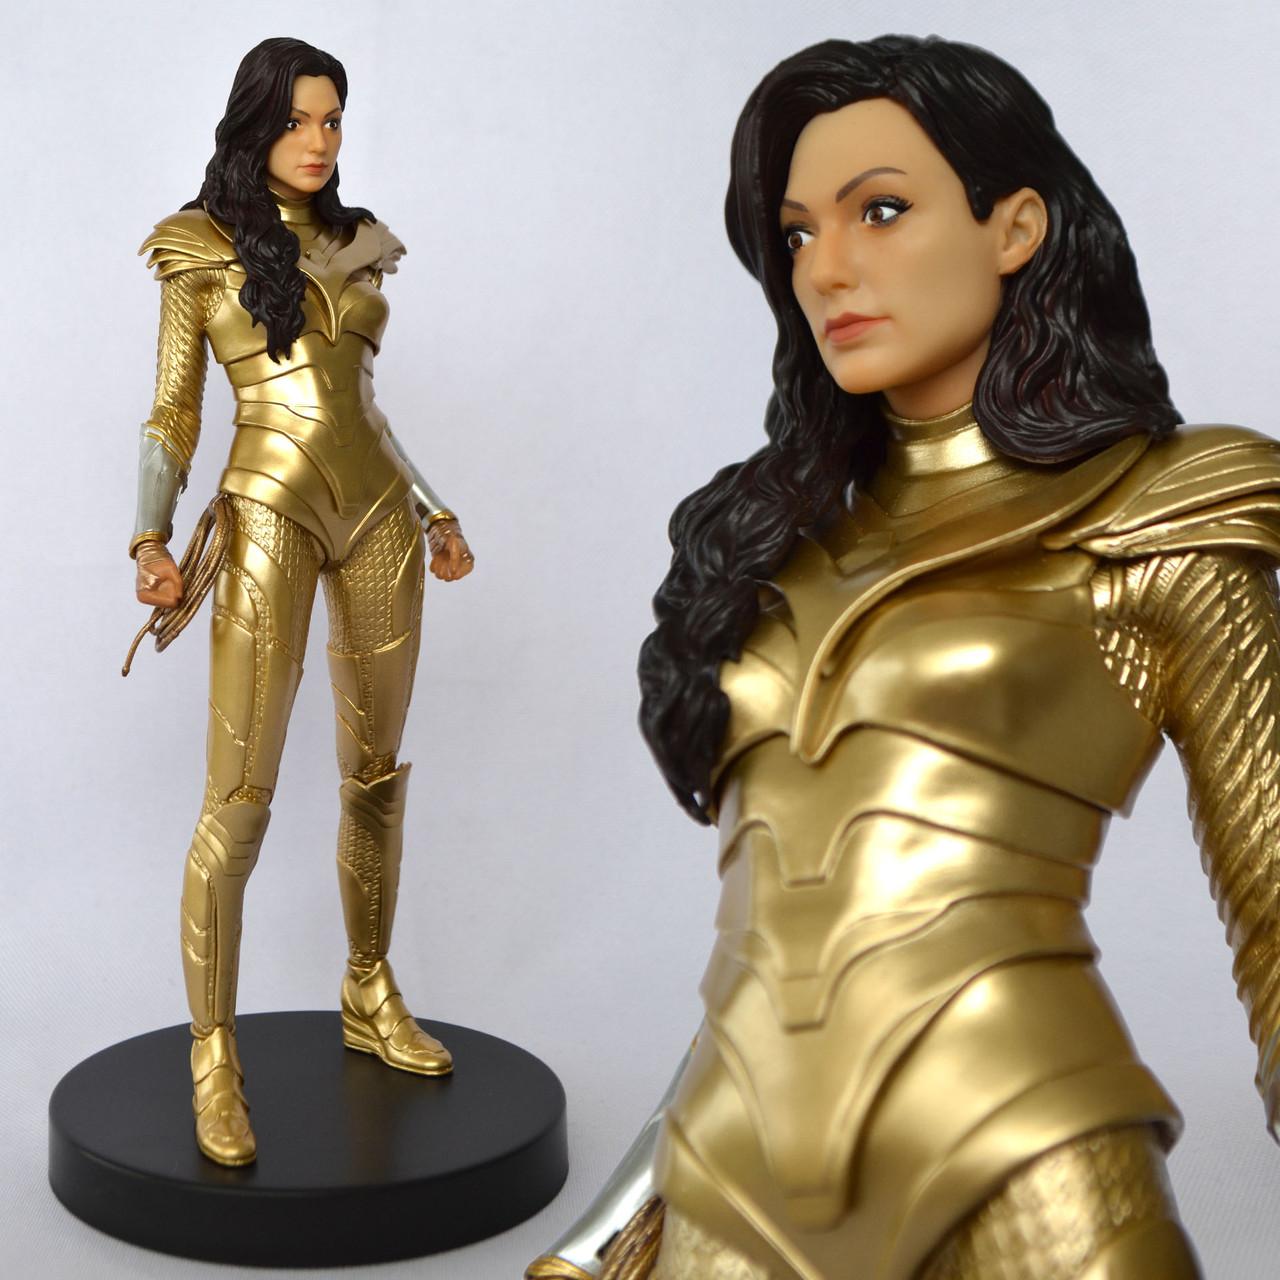 Фігурка Wonder Woman 1984 - Special Figure - FuRyu